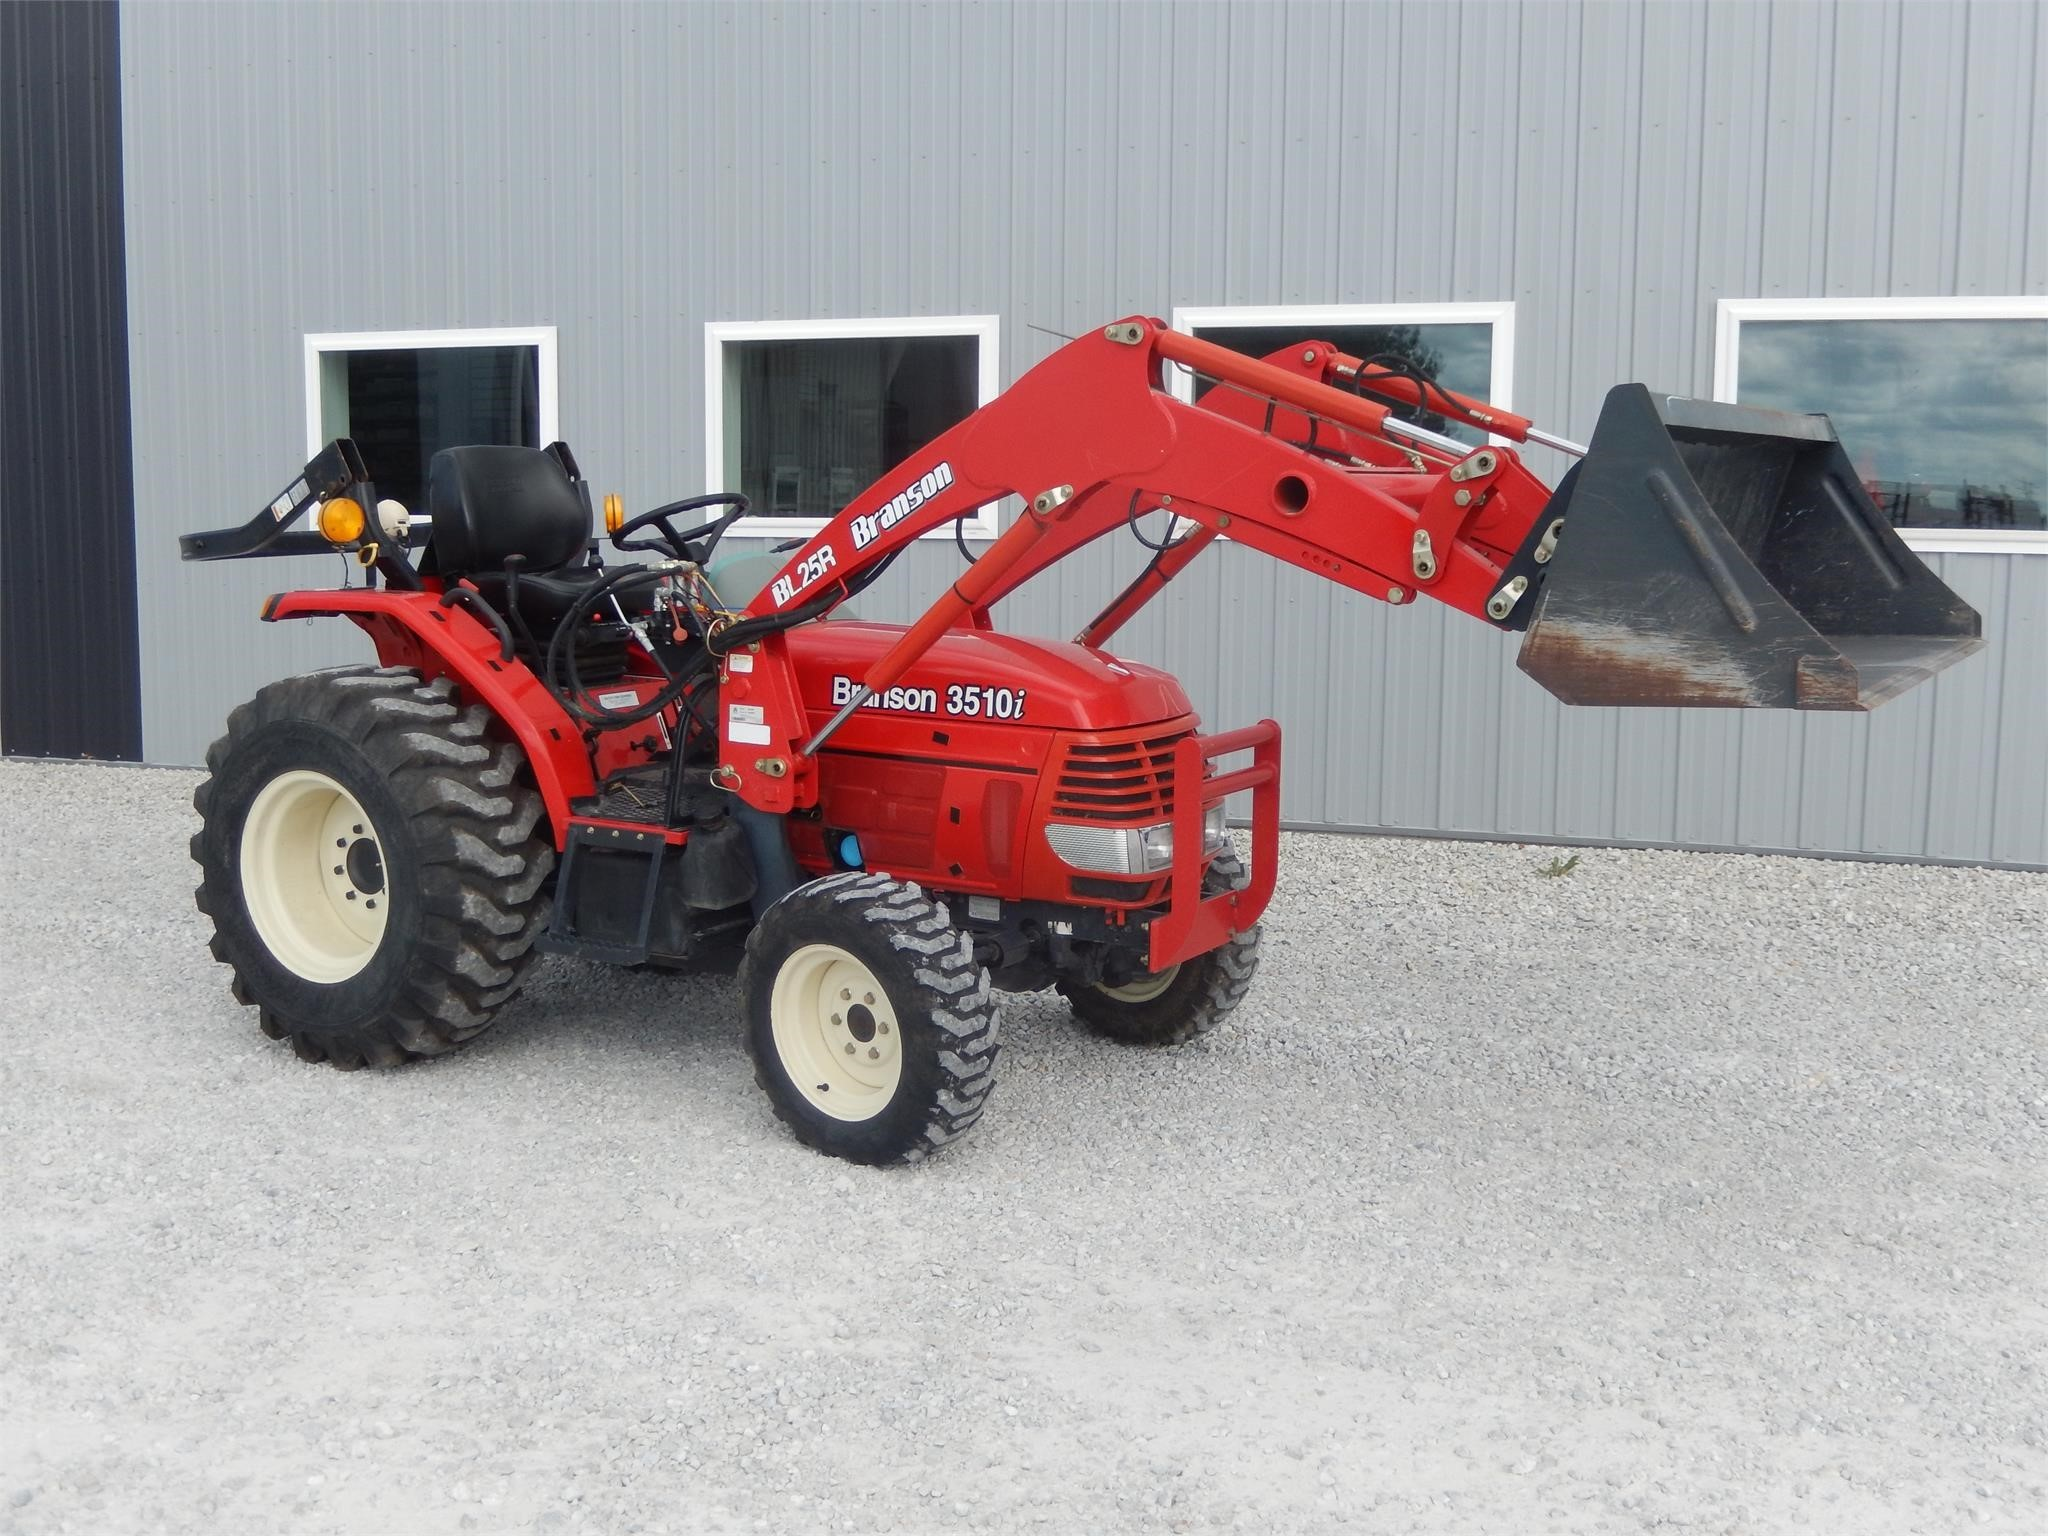 2010 Branson 3510i Tractor